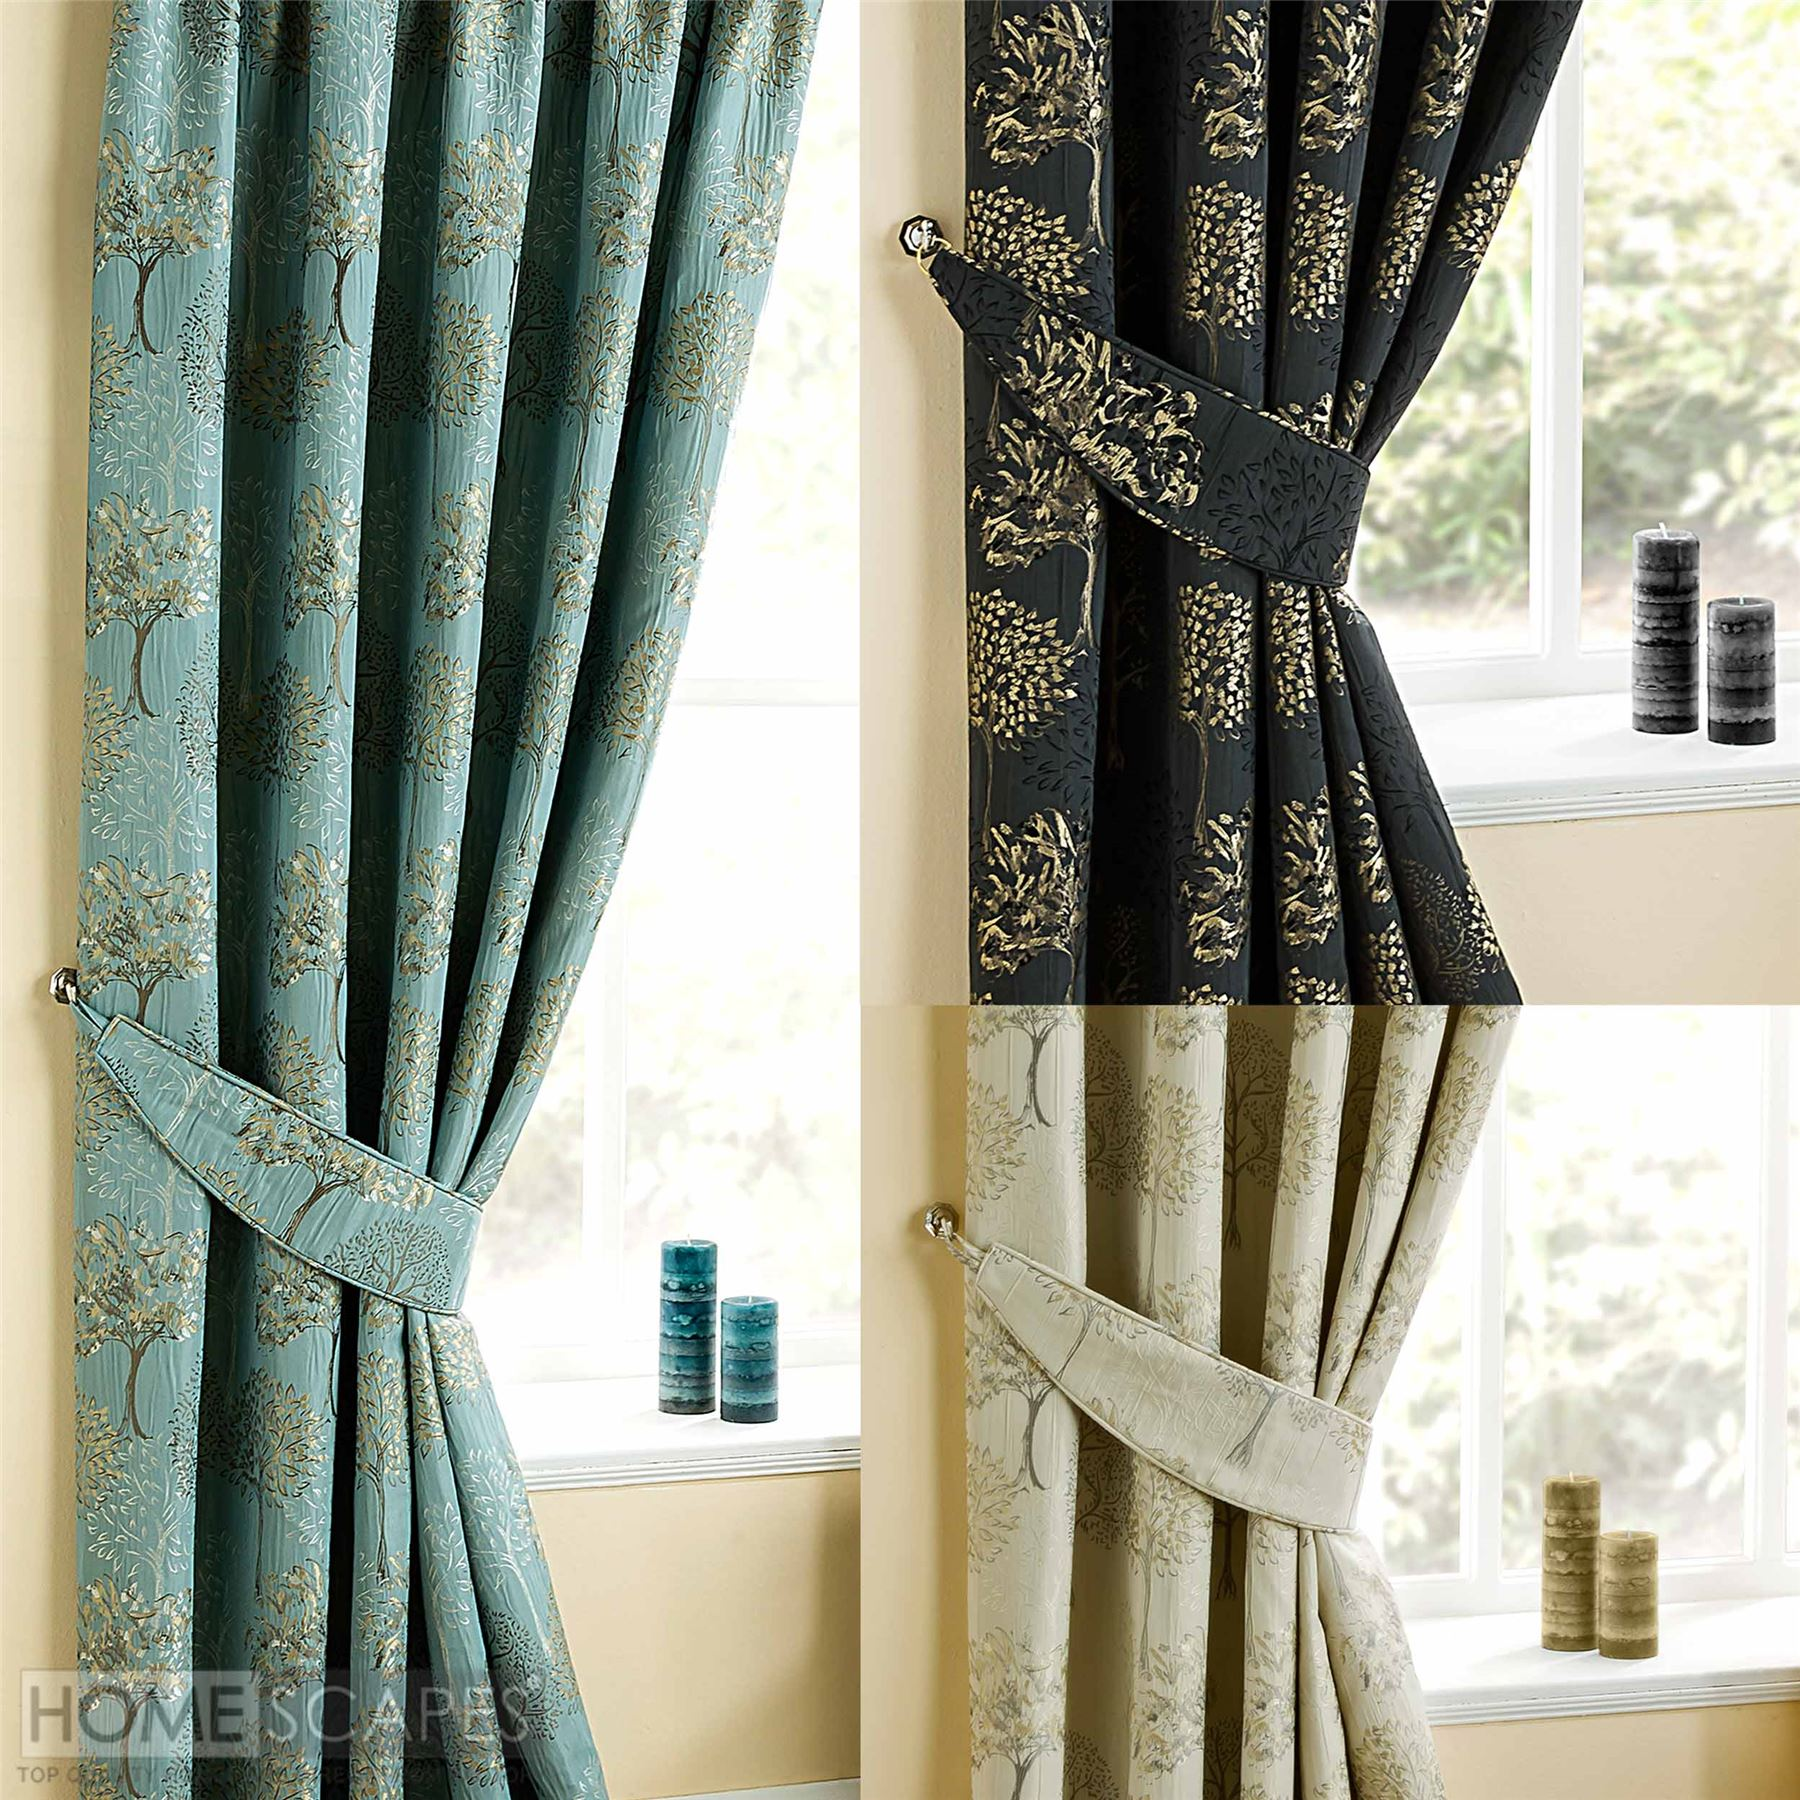 Curtains Tie Backs Pair Duck Egg Blue, Jet Black, Natural